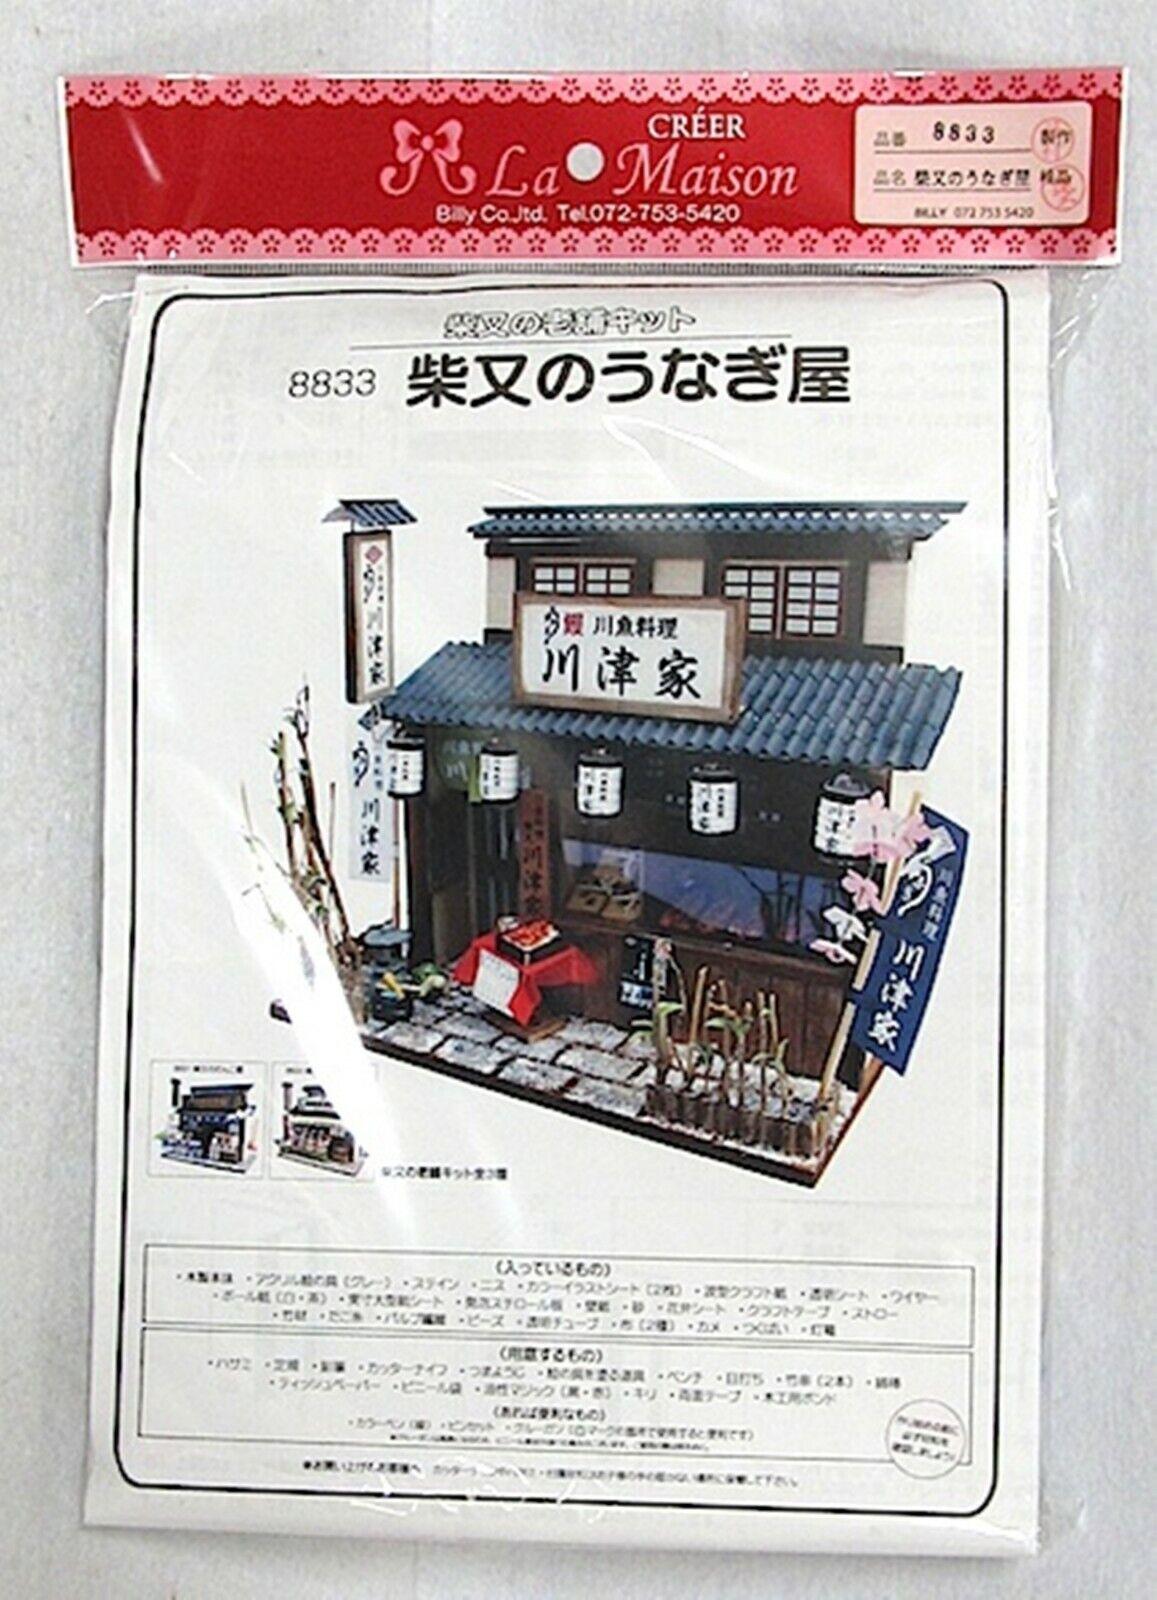 Billy Hecho a Mano Muñeca Casa Kit nostalgia Unagi anguila japonesa tienda 8833